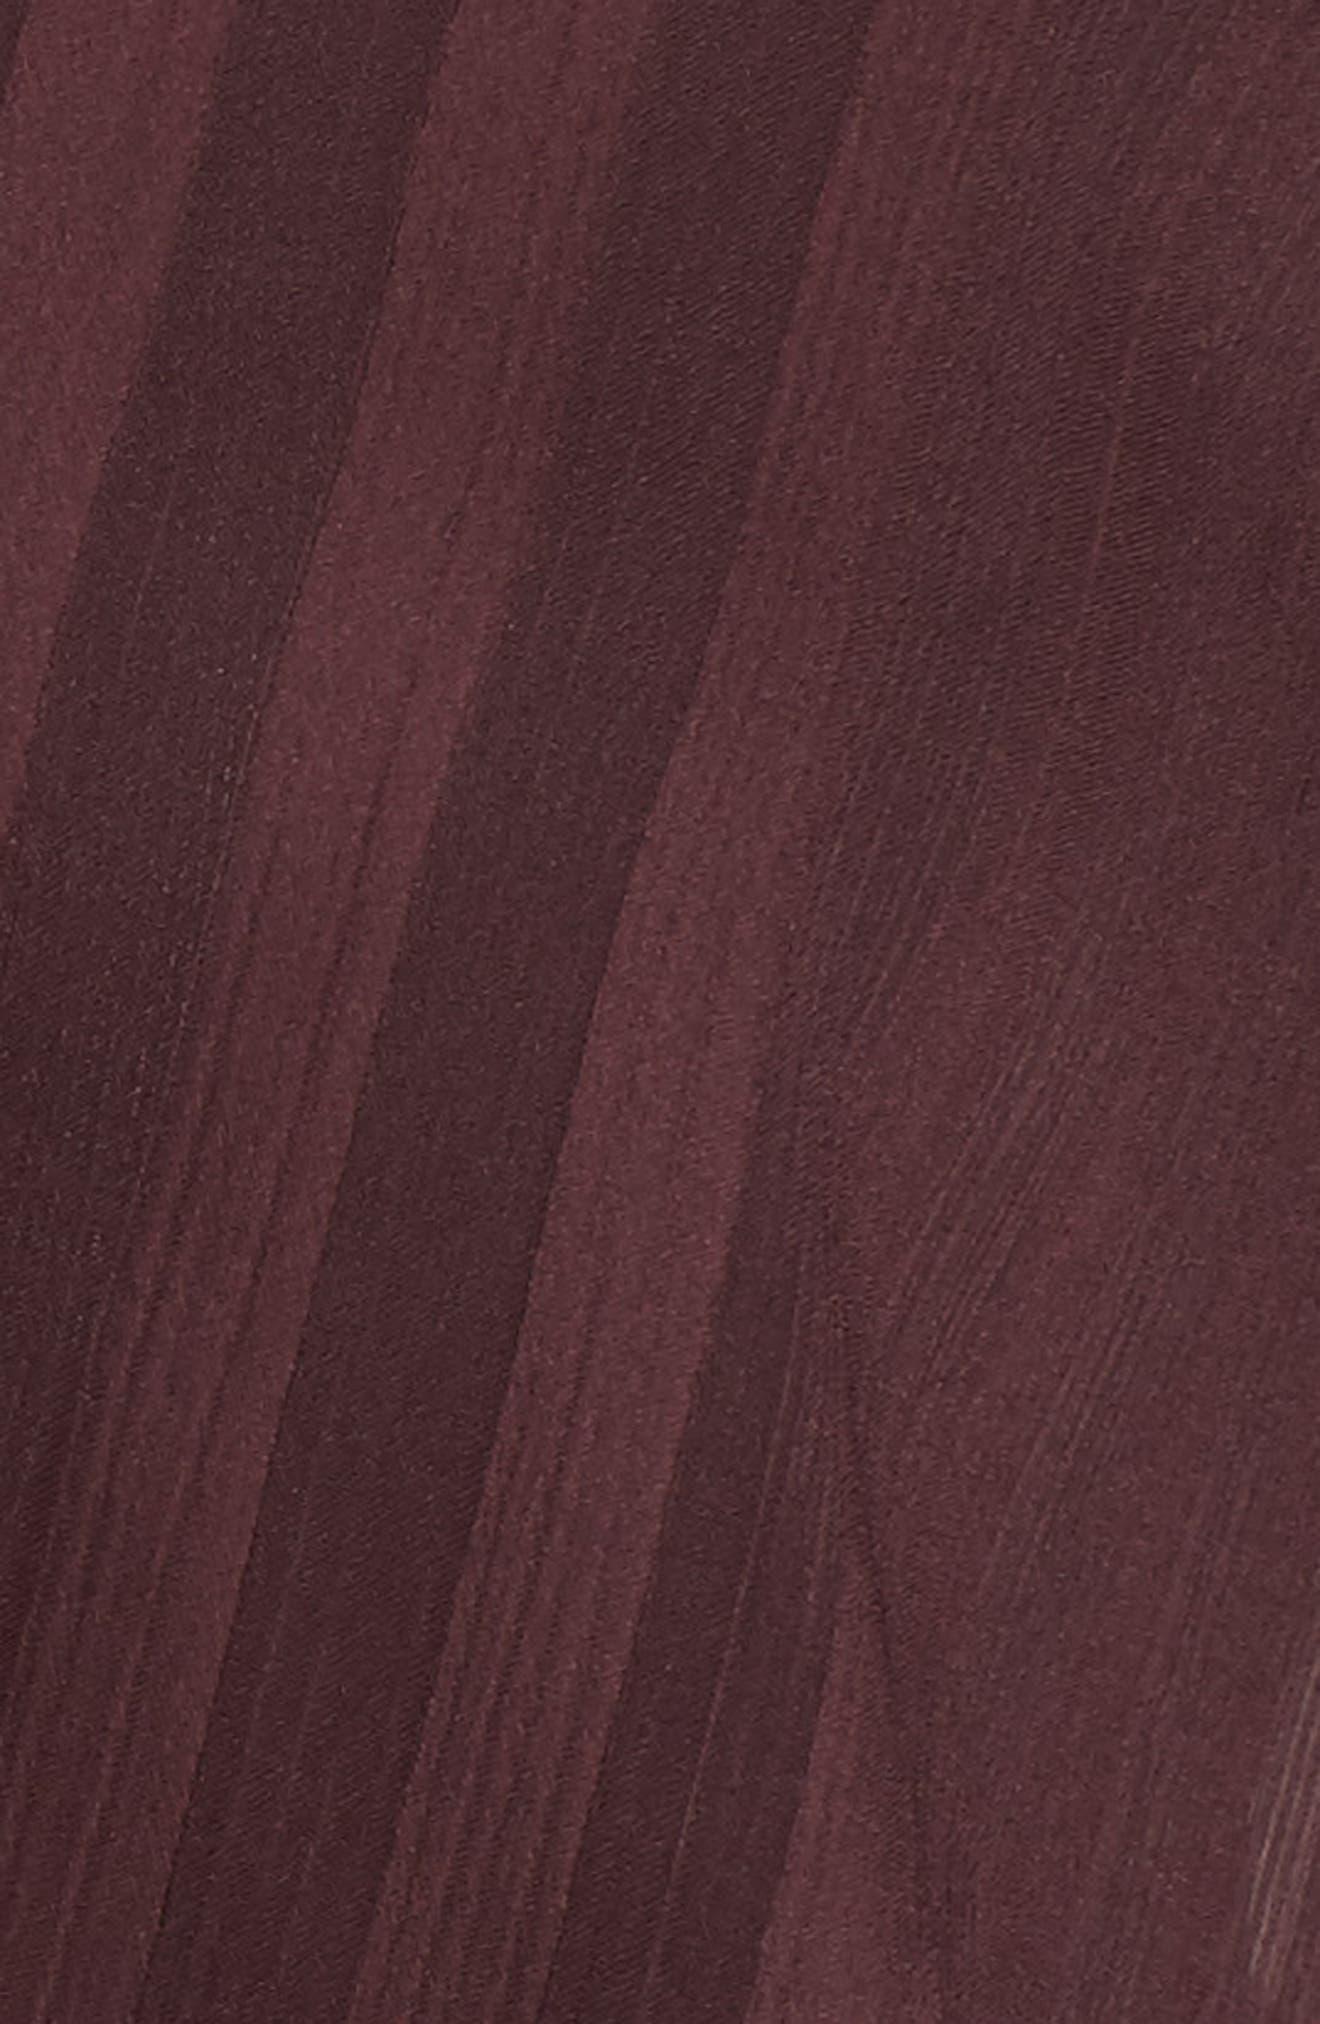 Sheer Shadow Stripe Top,                             Alternate thumbnail 20, color,